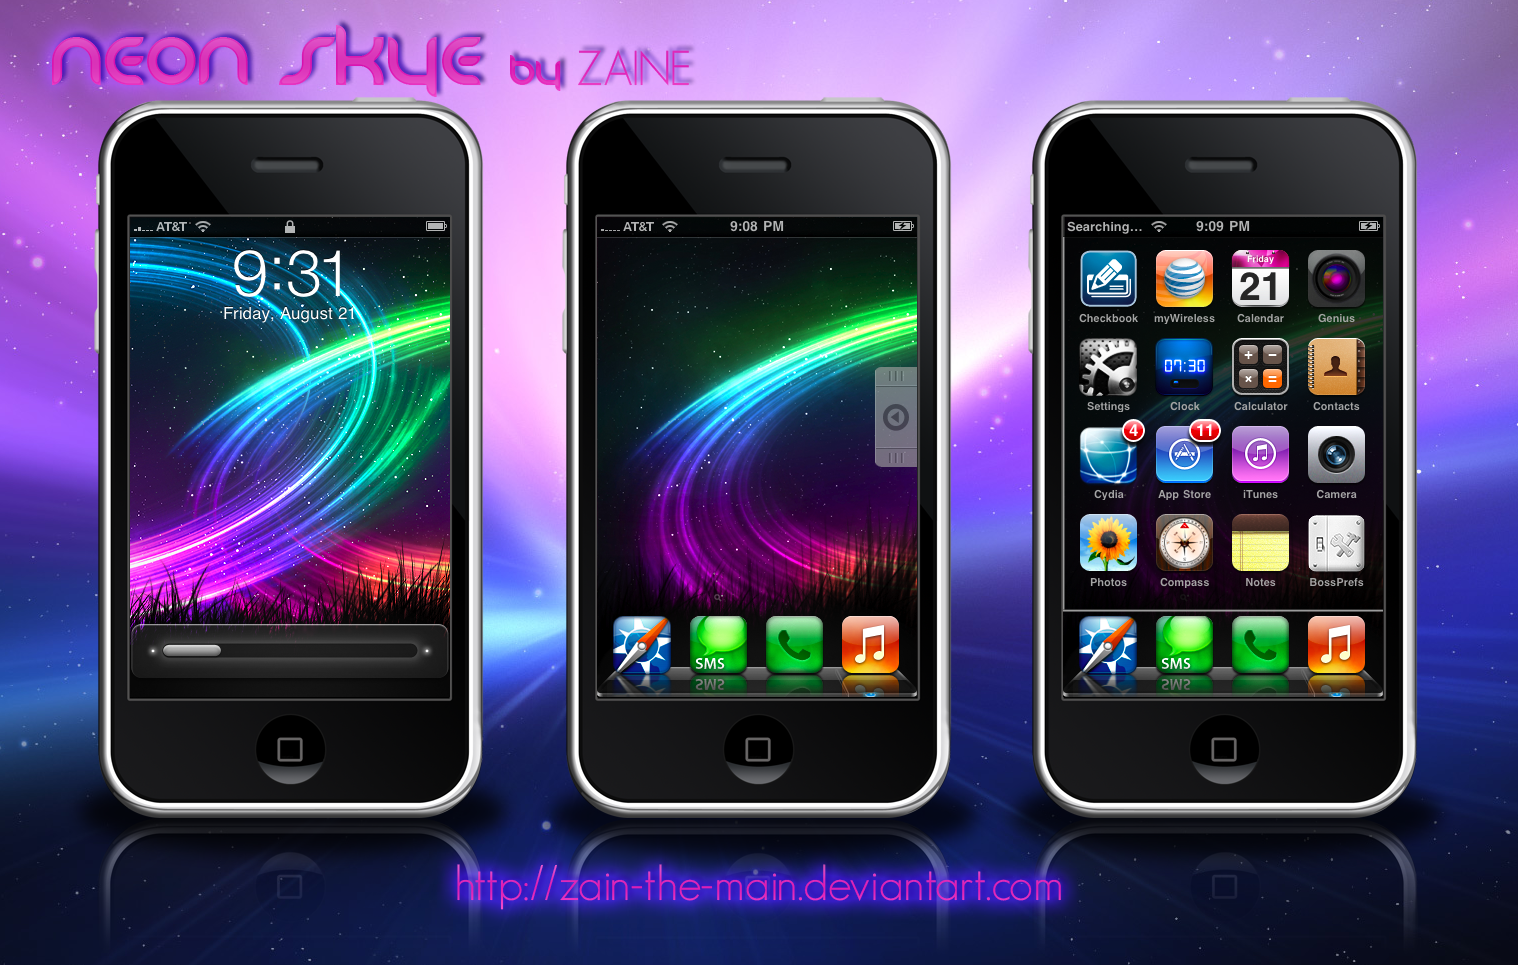 Neon Skye - iPhone Theme